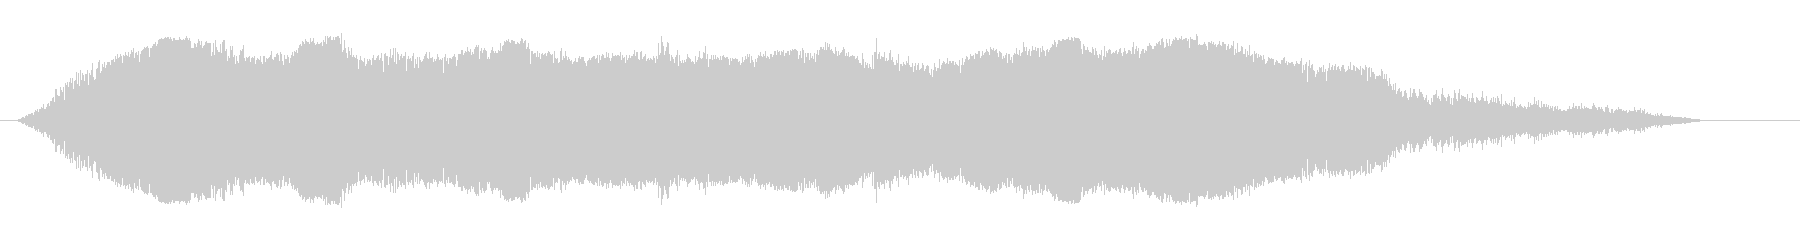 GTSカー;スロー(数)、Cu S...の未再生の波形